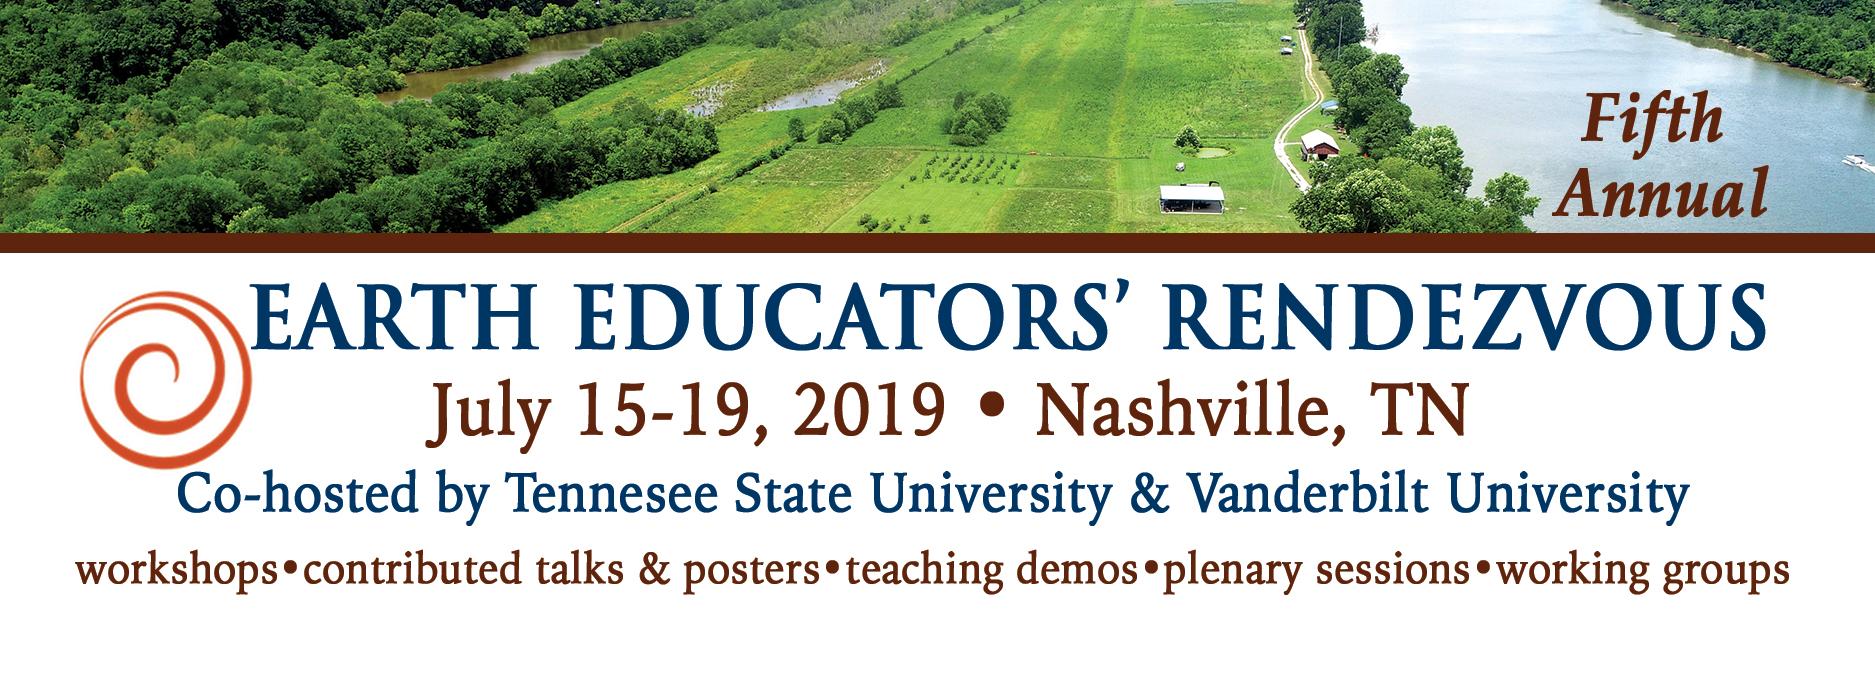 Earth Educators Rendezvous Logo